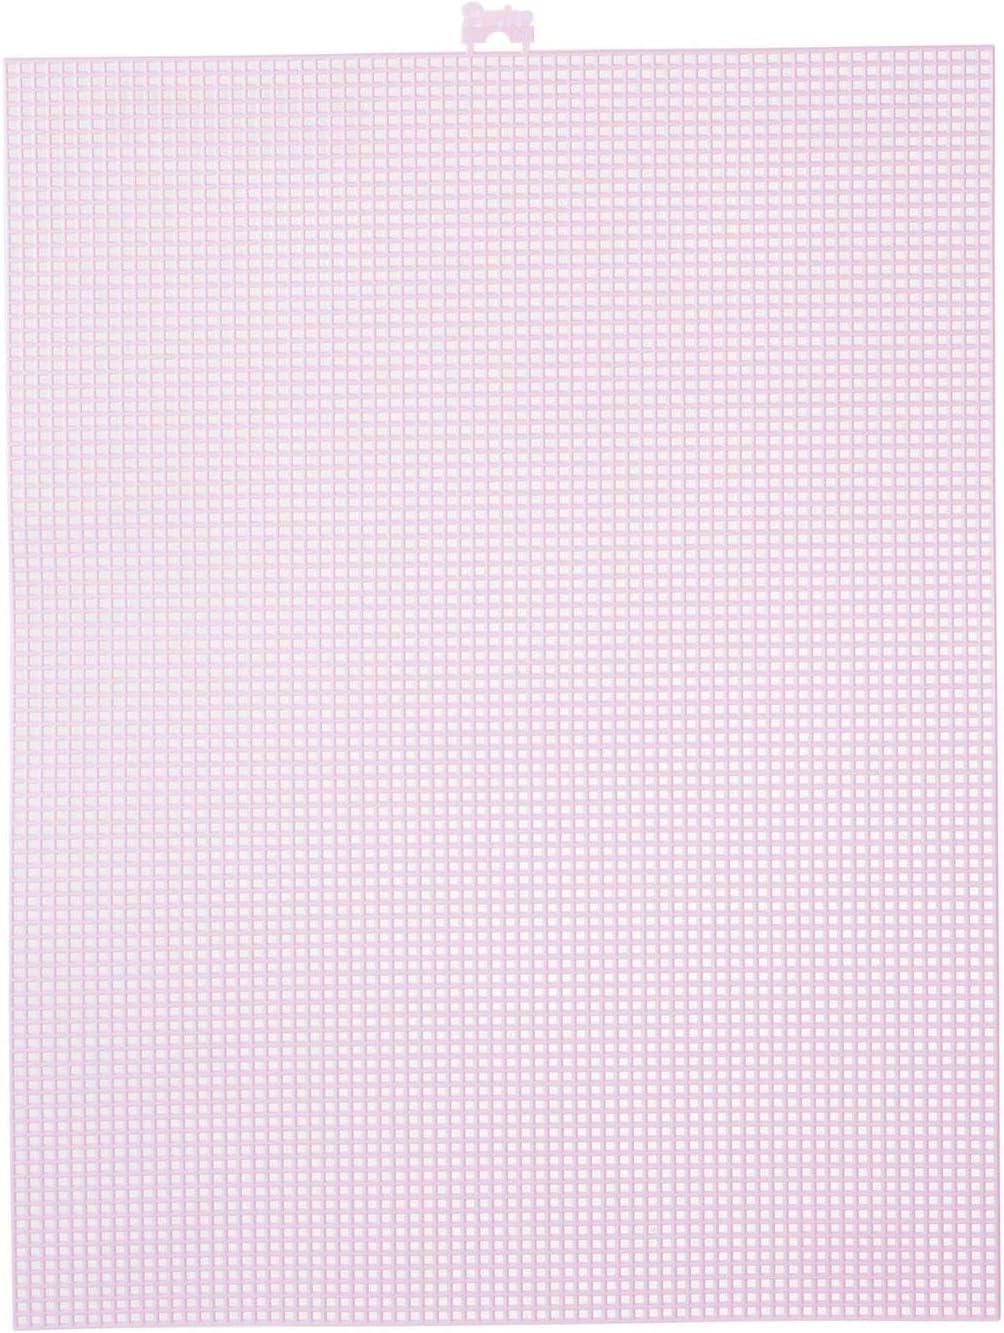 7 Mesh Count Black Plastic Canvas Sheet 10.5 x 13.5 Inch 1 Sheet